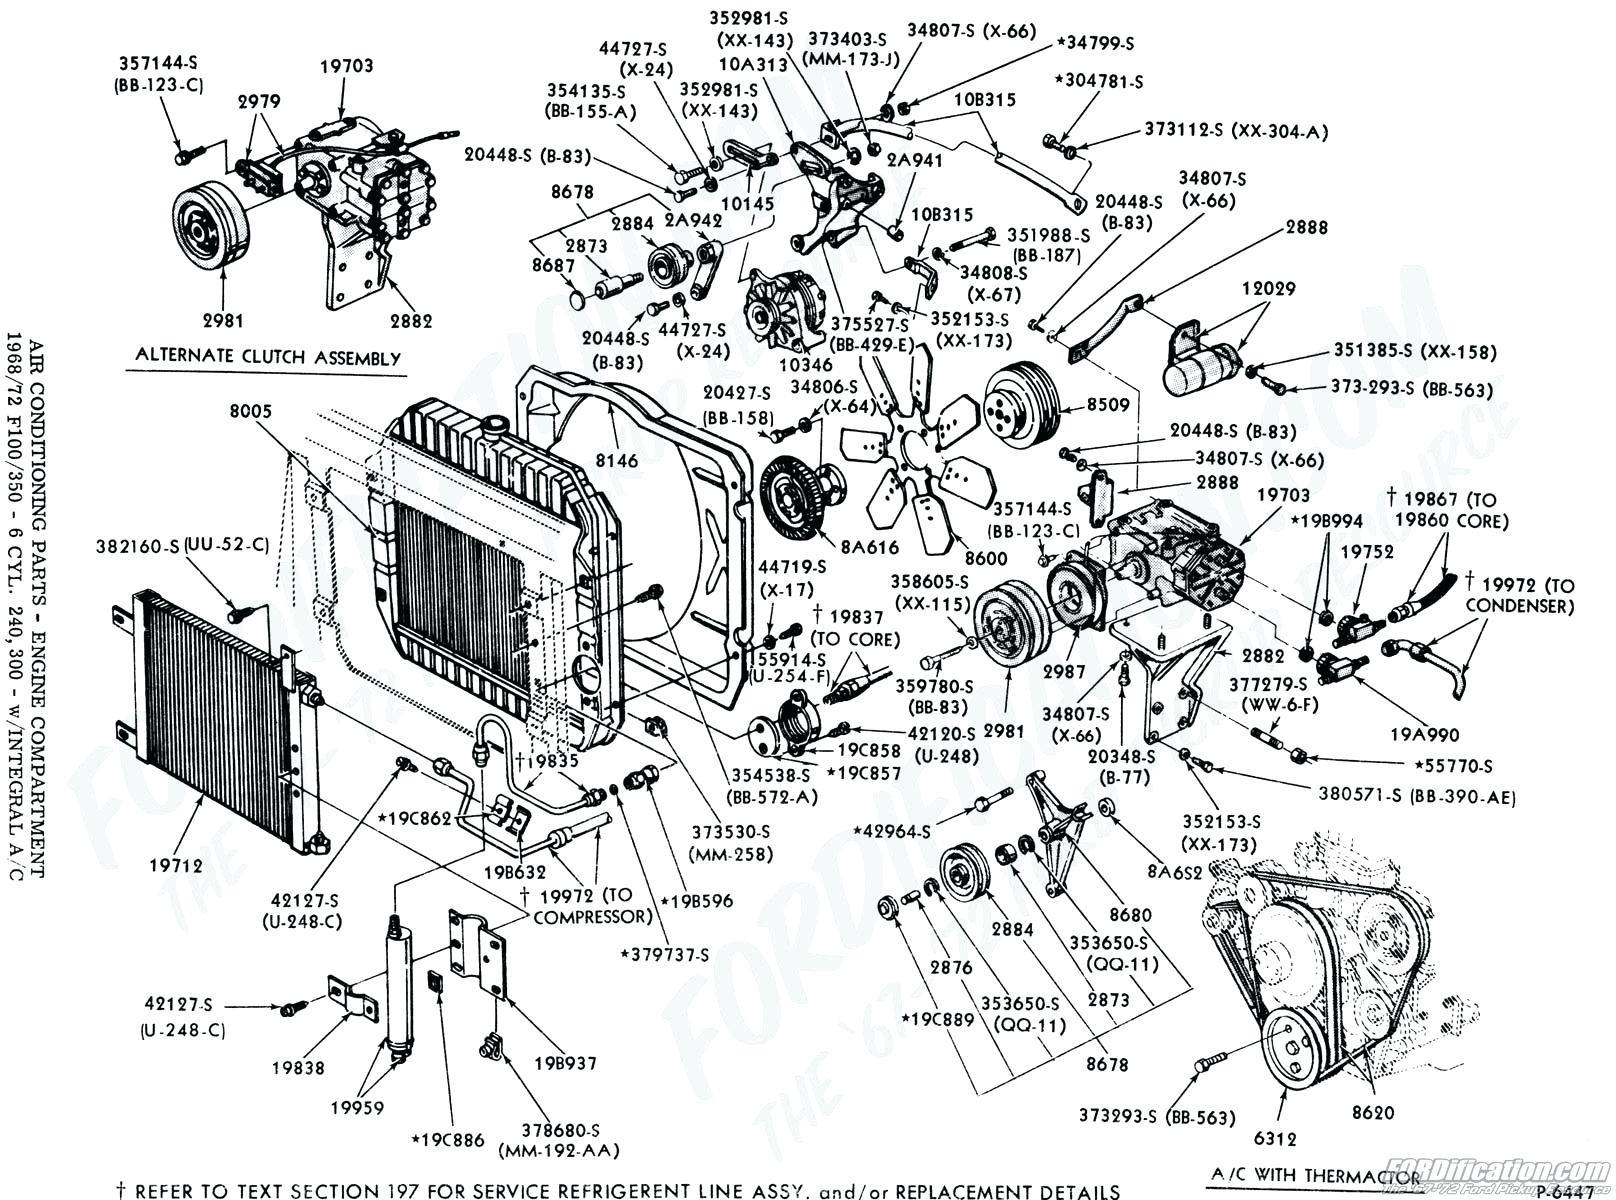 Ford 302 Motor Specs